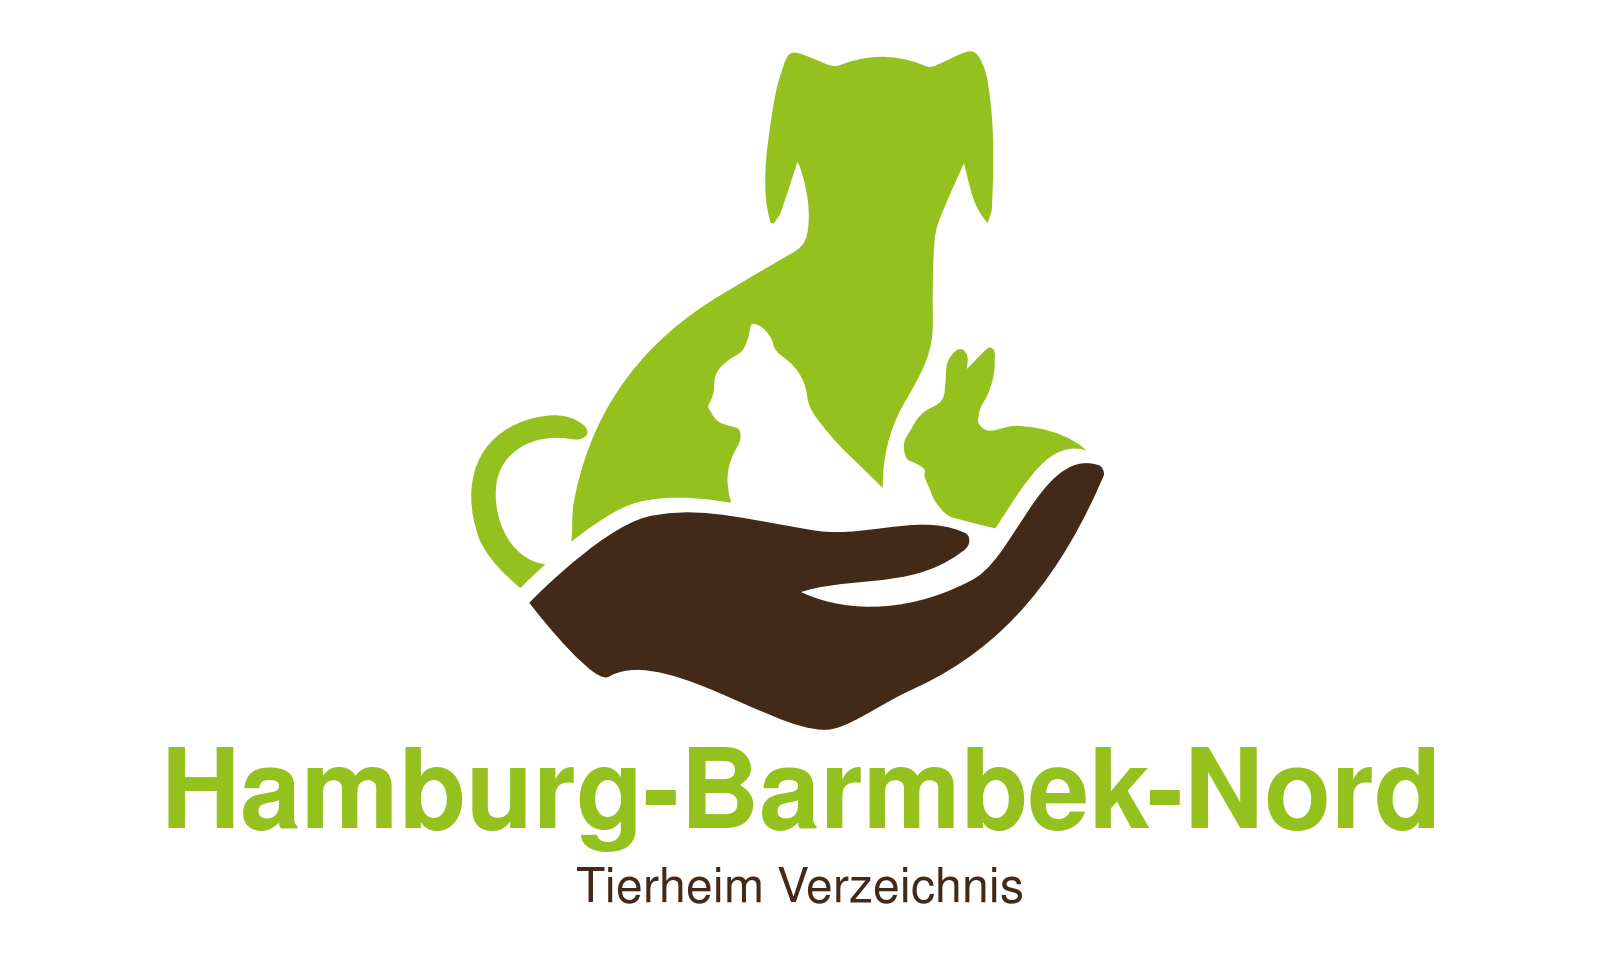 Tierheim Hamburg Barmbek-Nord